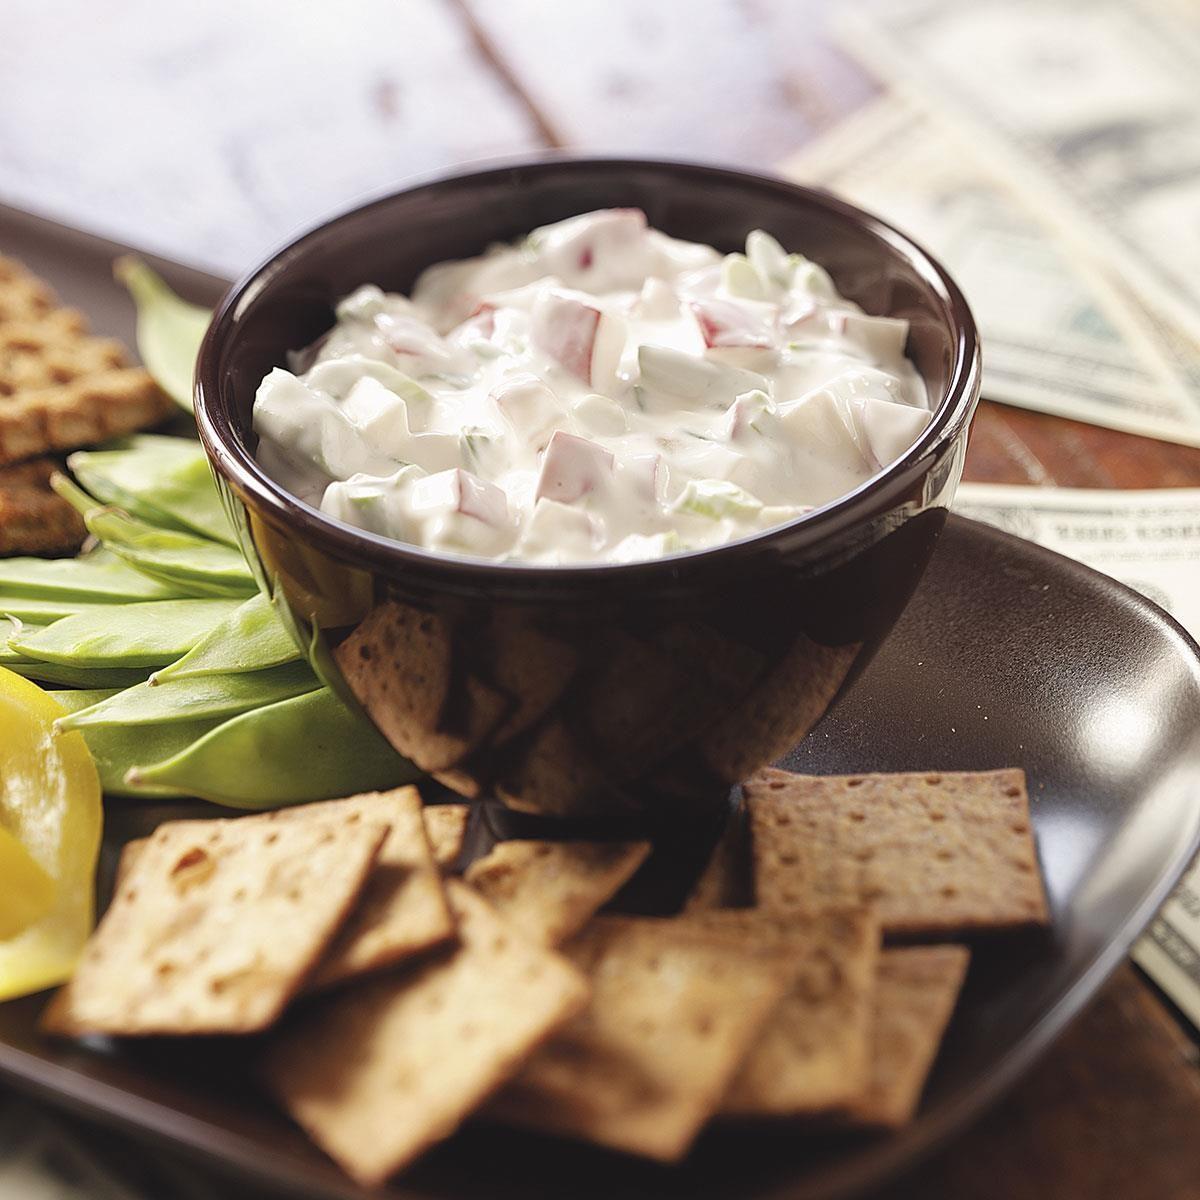 Creamy Radish Dip Recipe | Taste of Home